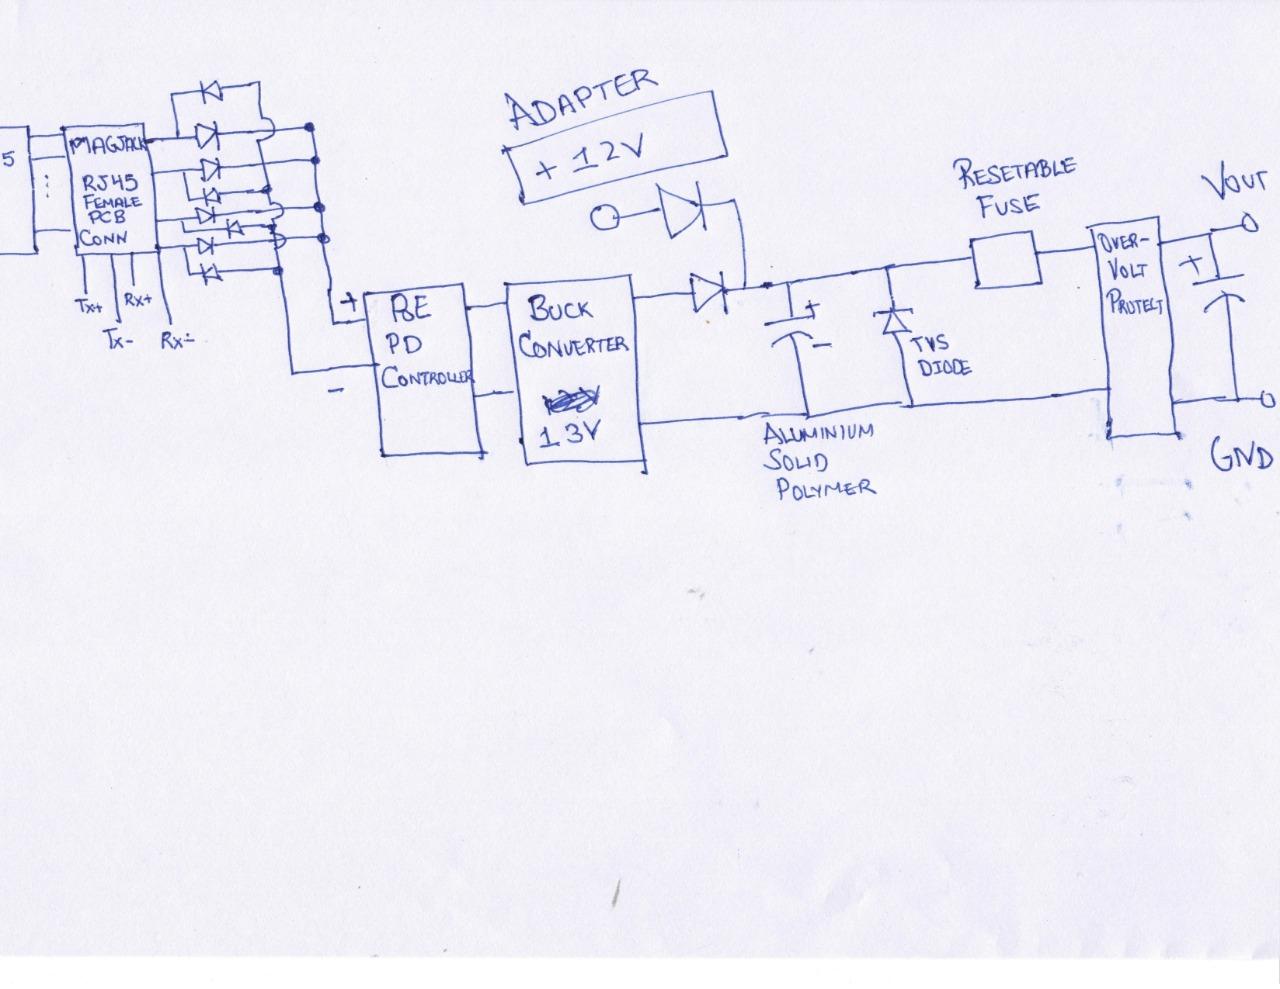 hight resolution of question regarding rectifier design using diode